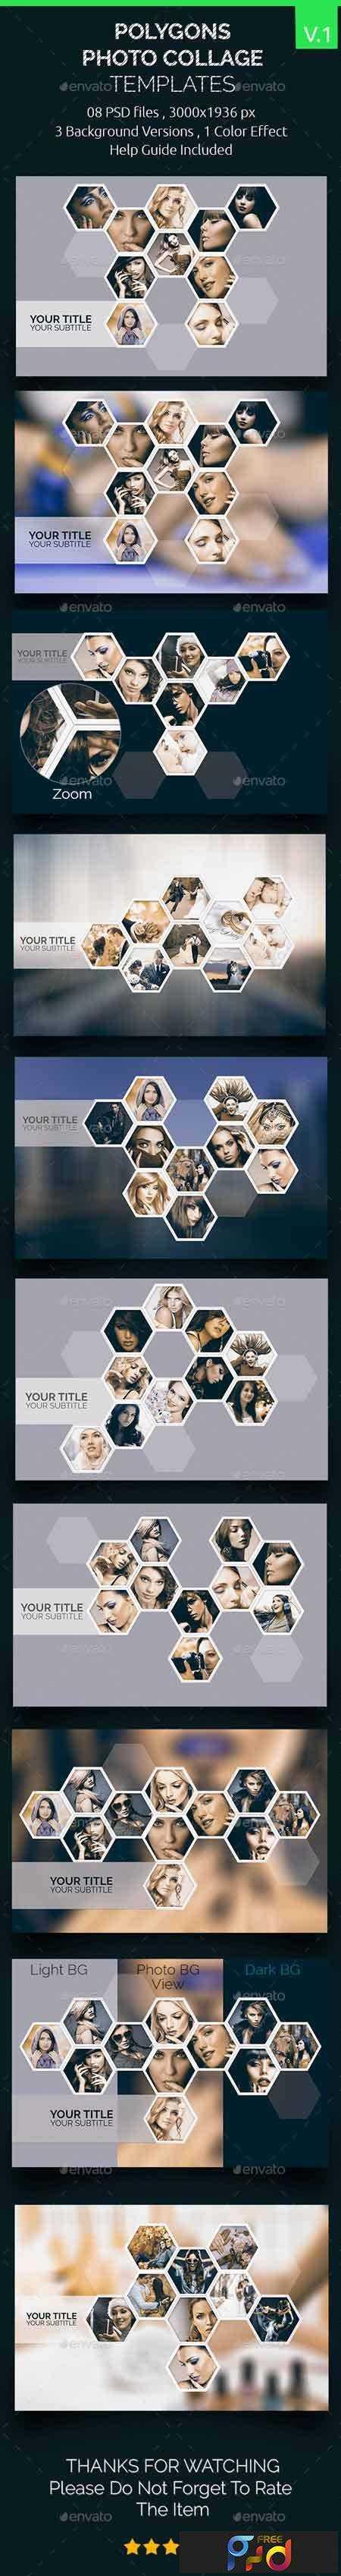 freepsdvn-com_1474476313_polygons-photo-collage-templates-17072964